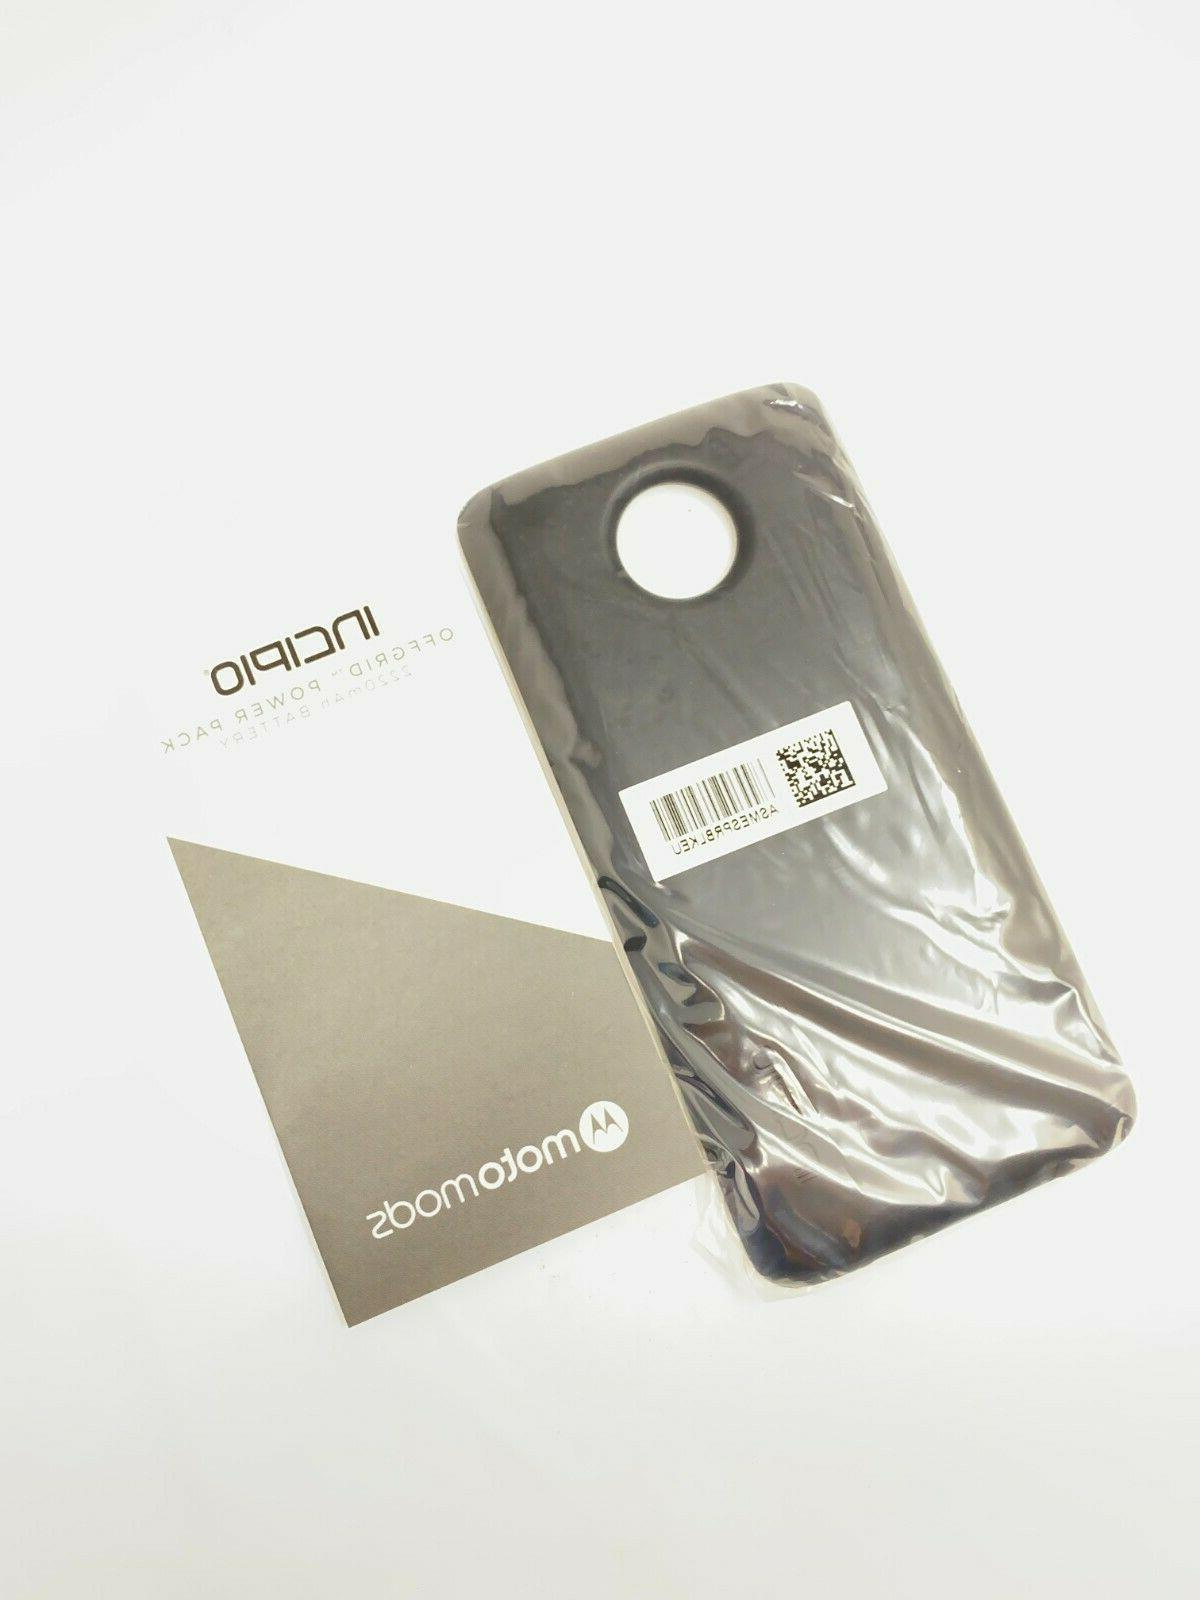 Incipio Power - Phone